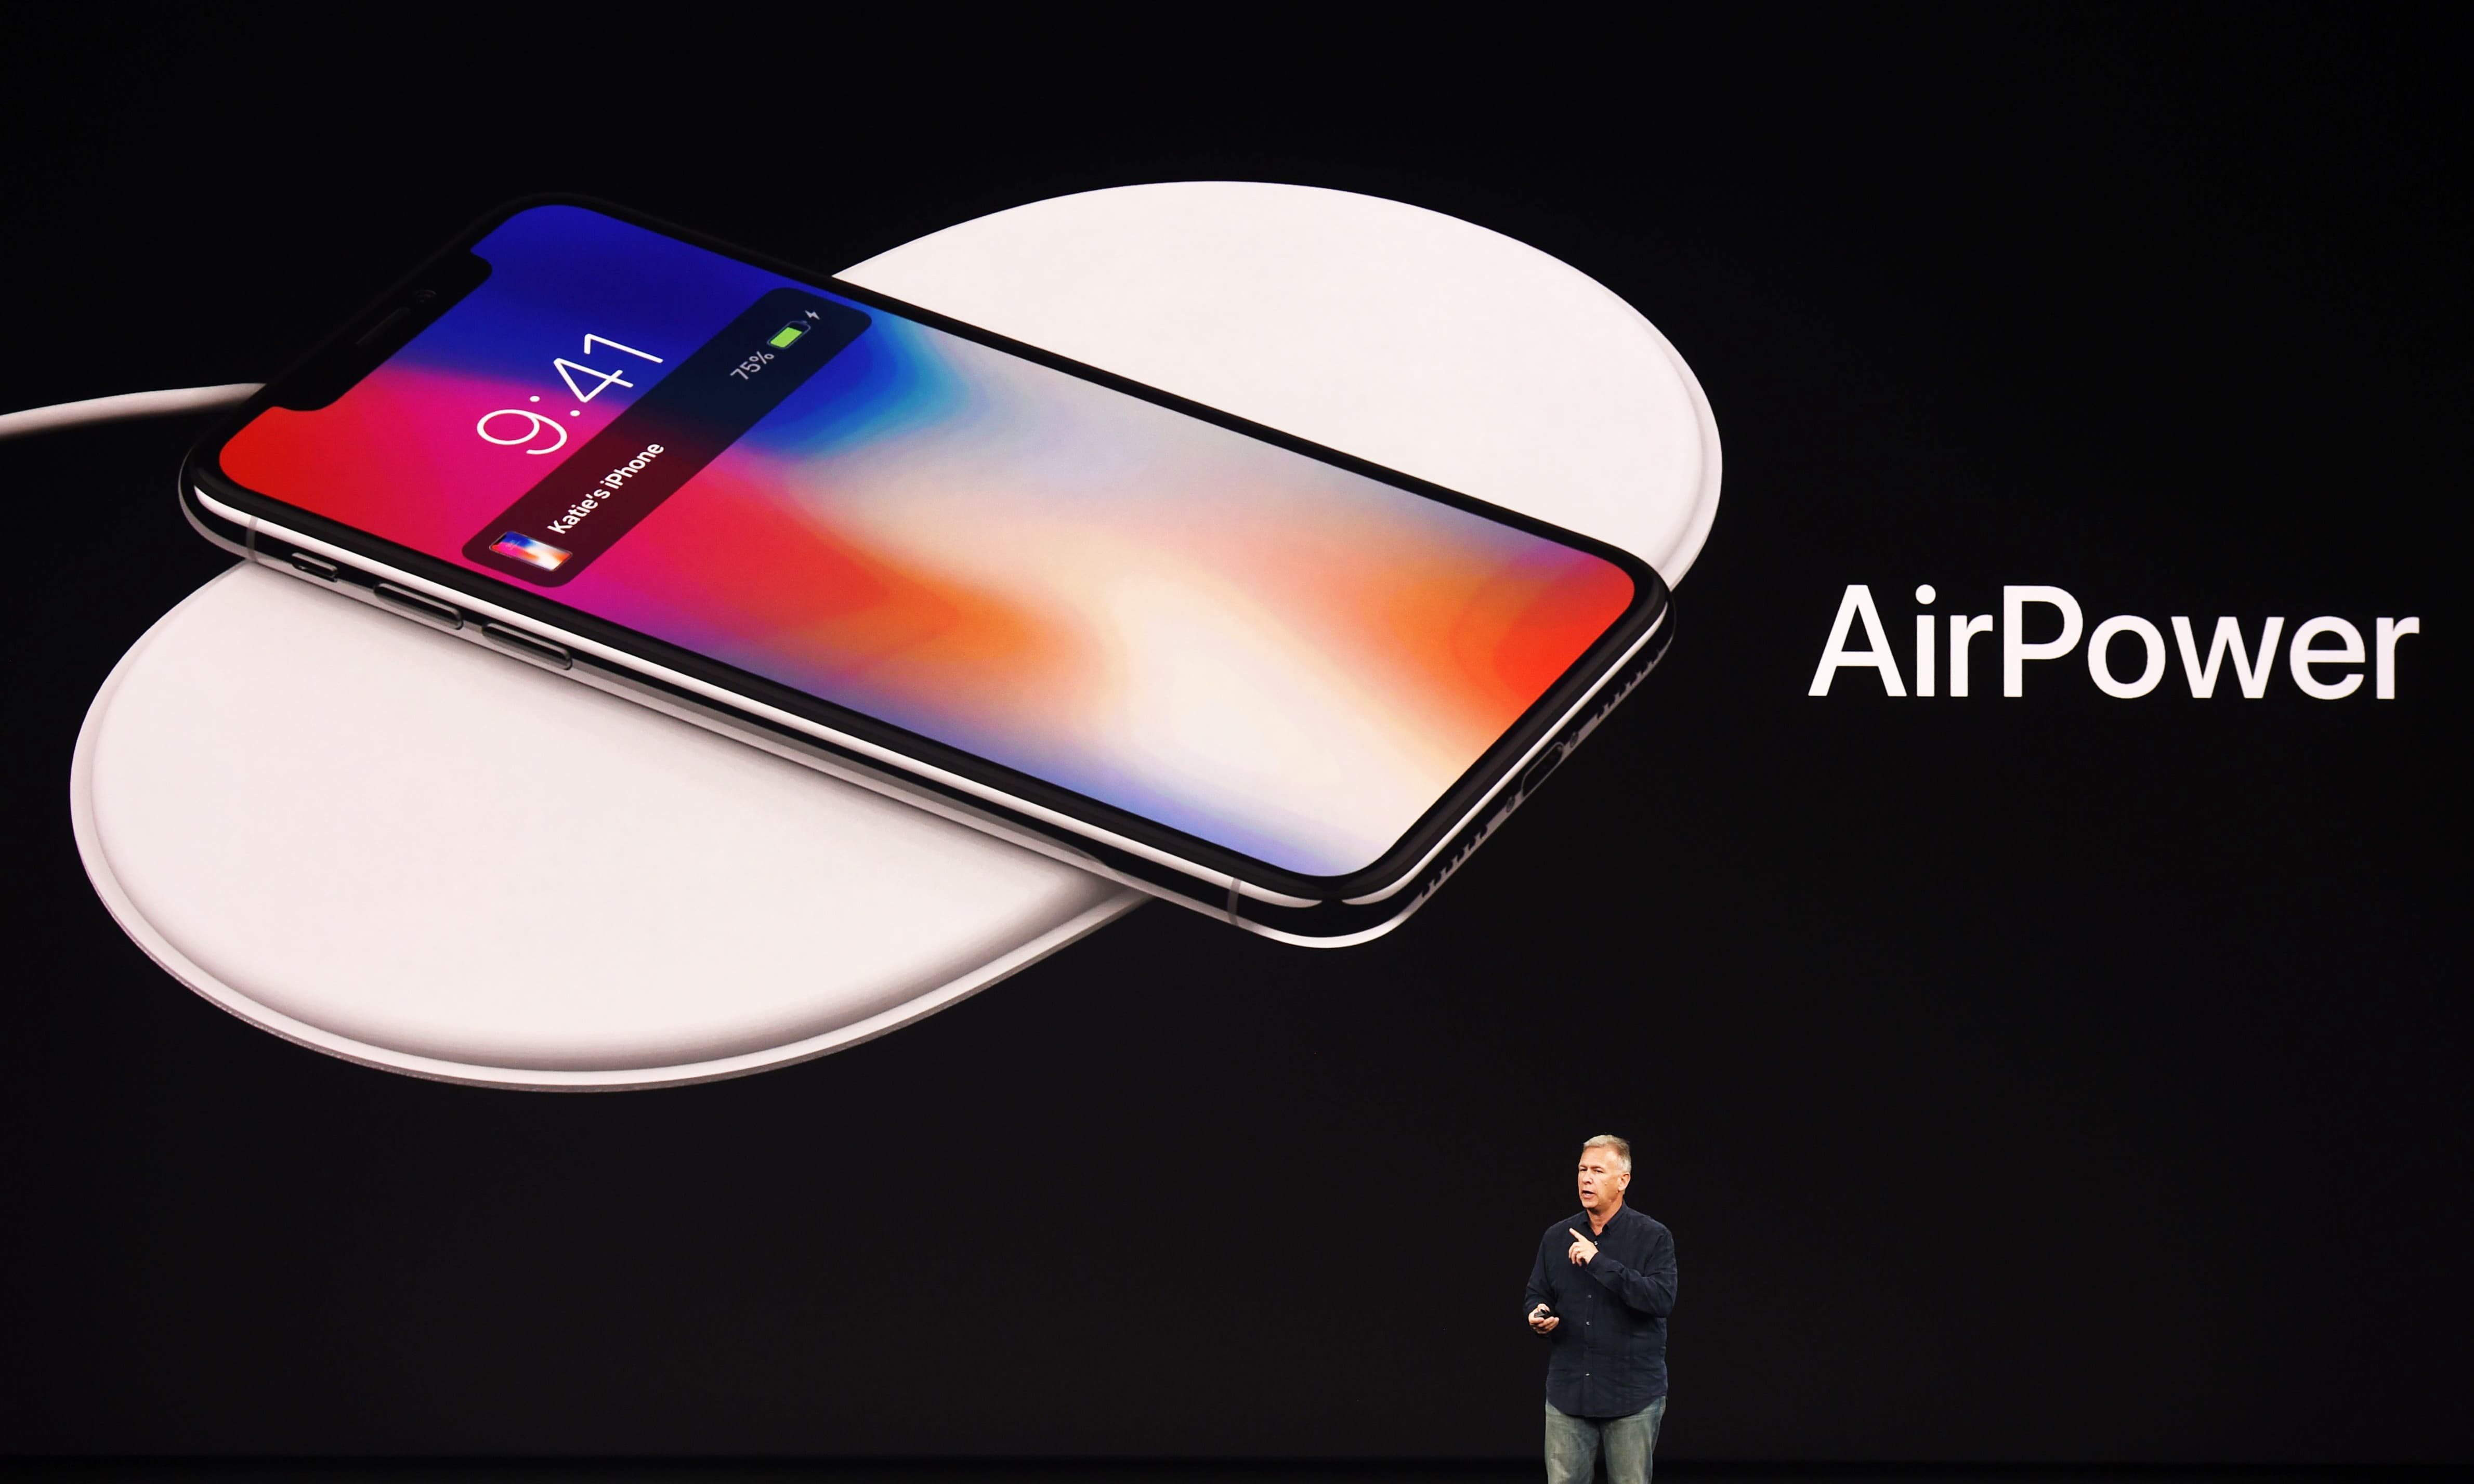 Apple unveils three new iPhones starting at $699